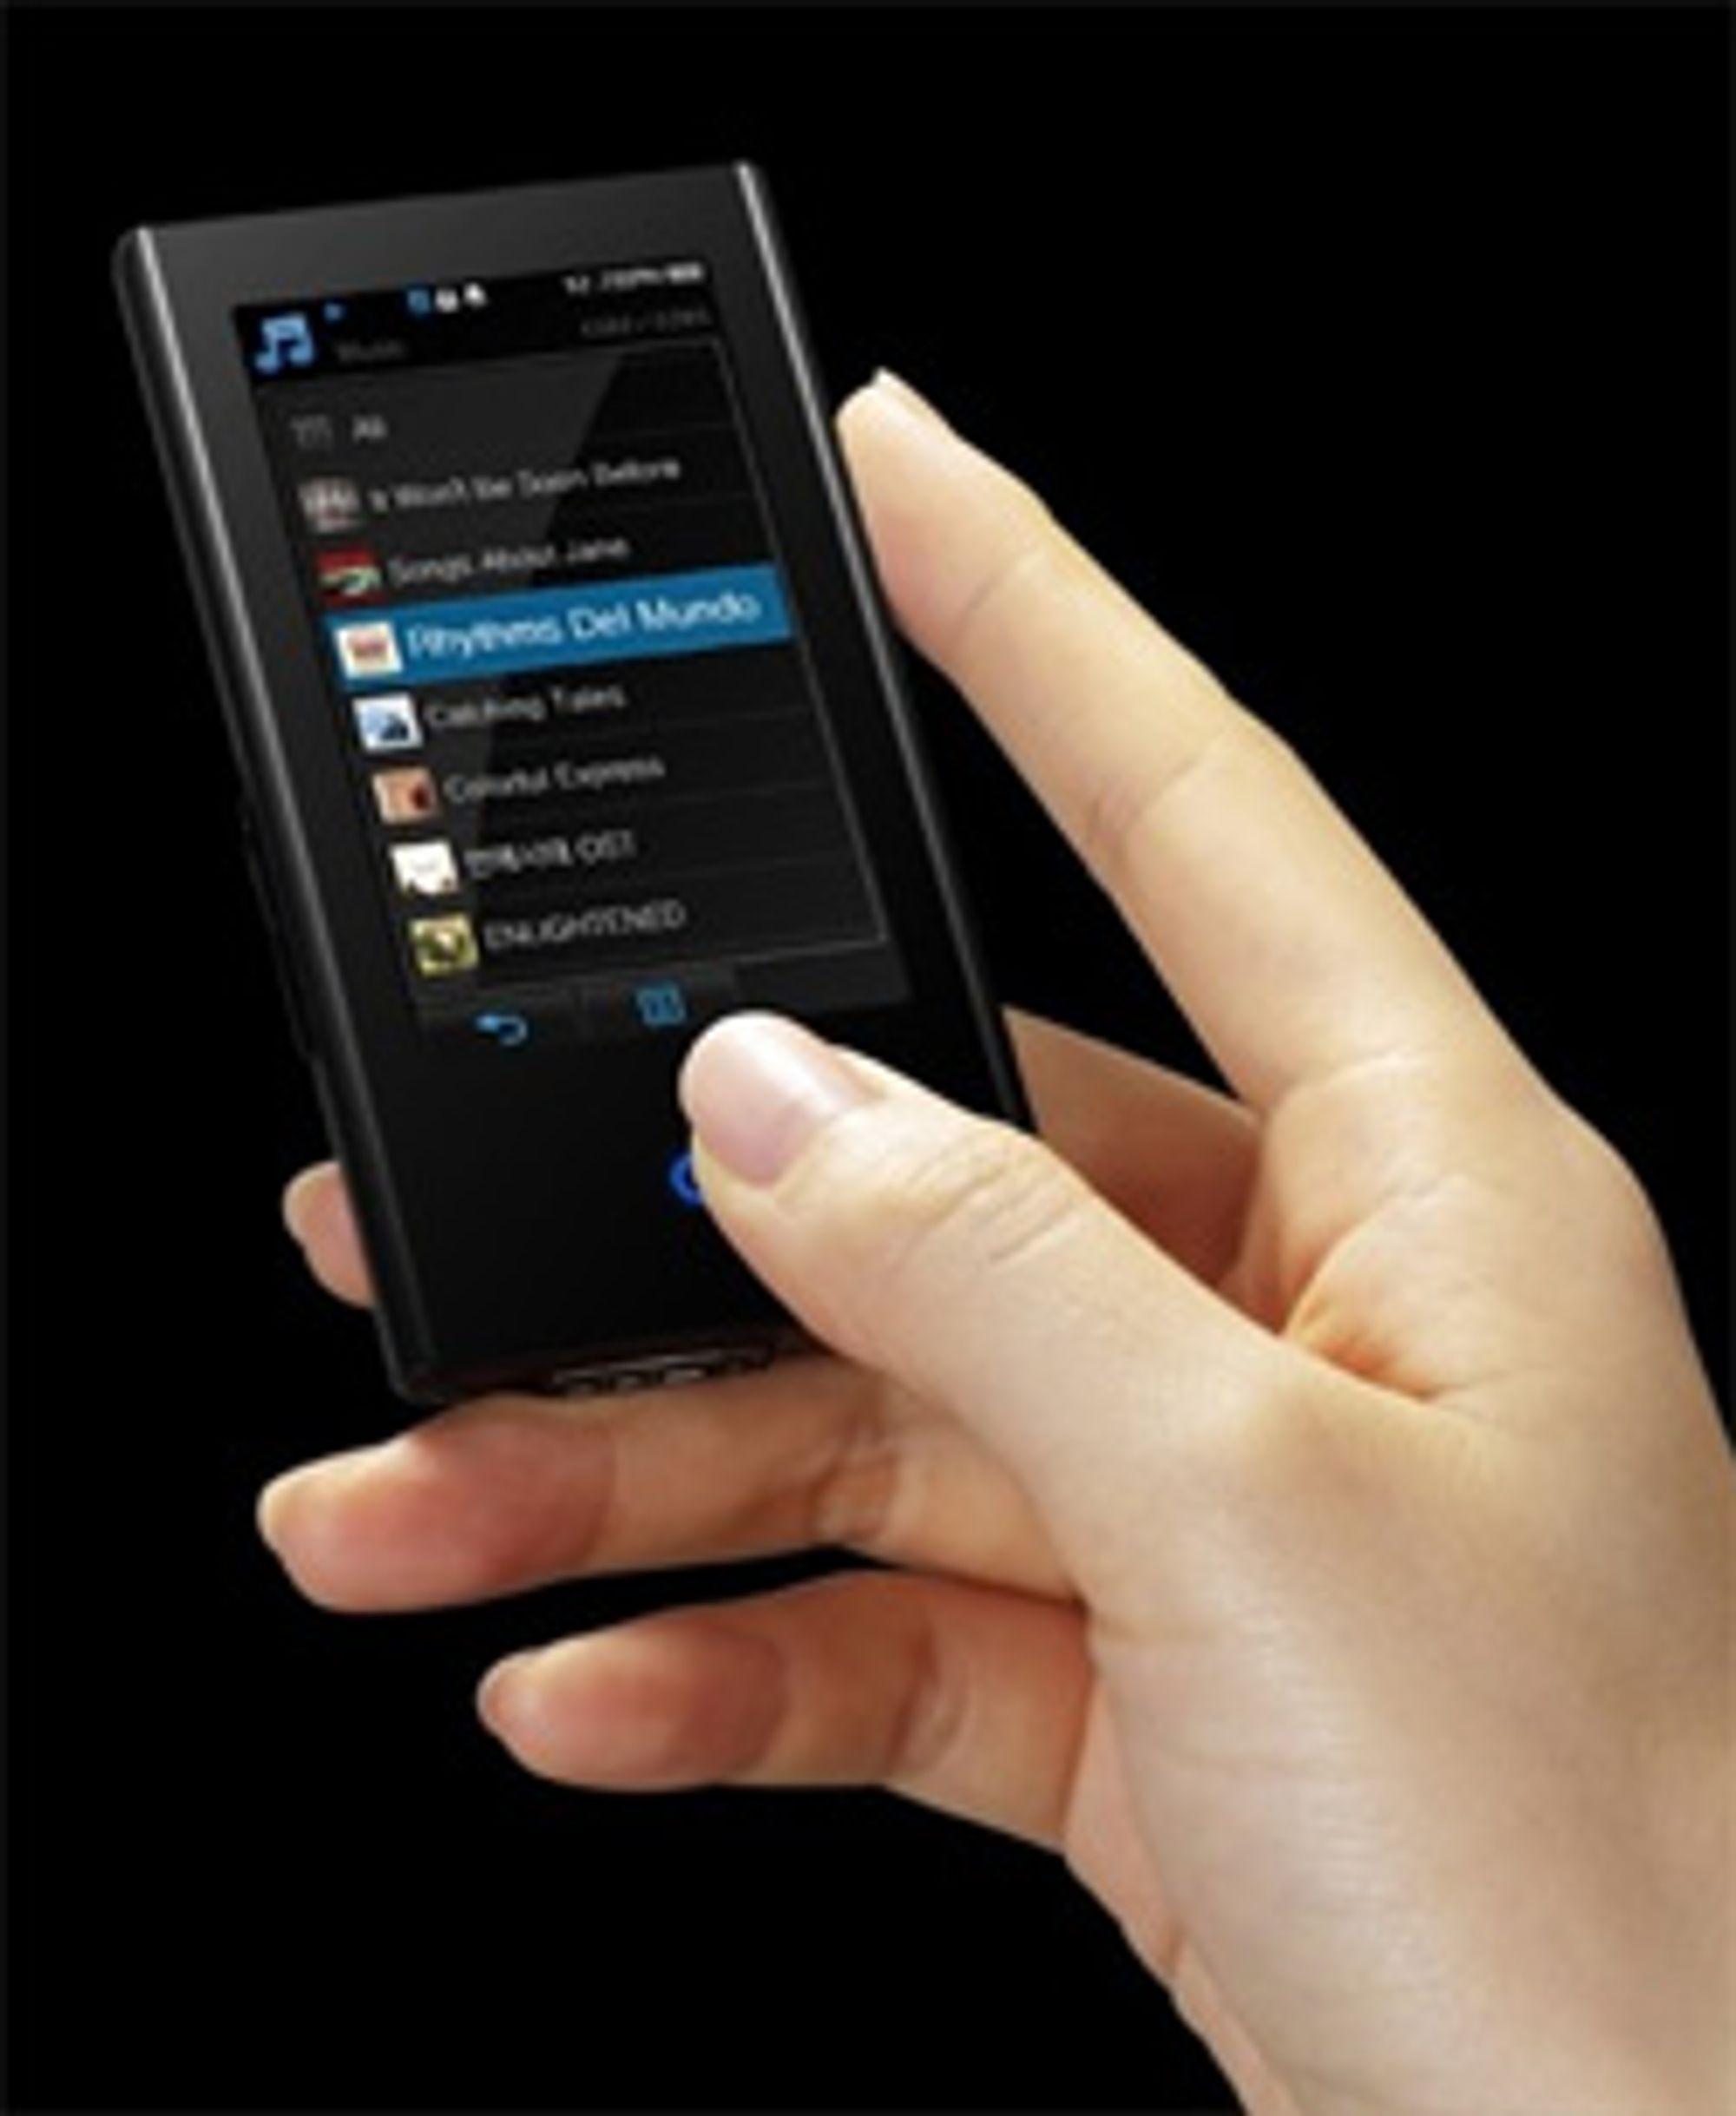 Slik ser Samsungs YP-P2 ut i svart. (Bilde: Engadget)